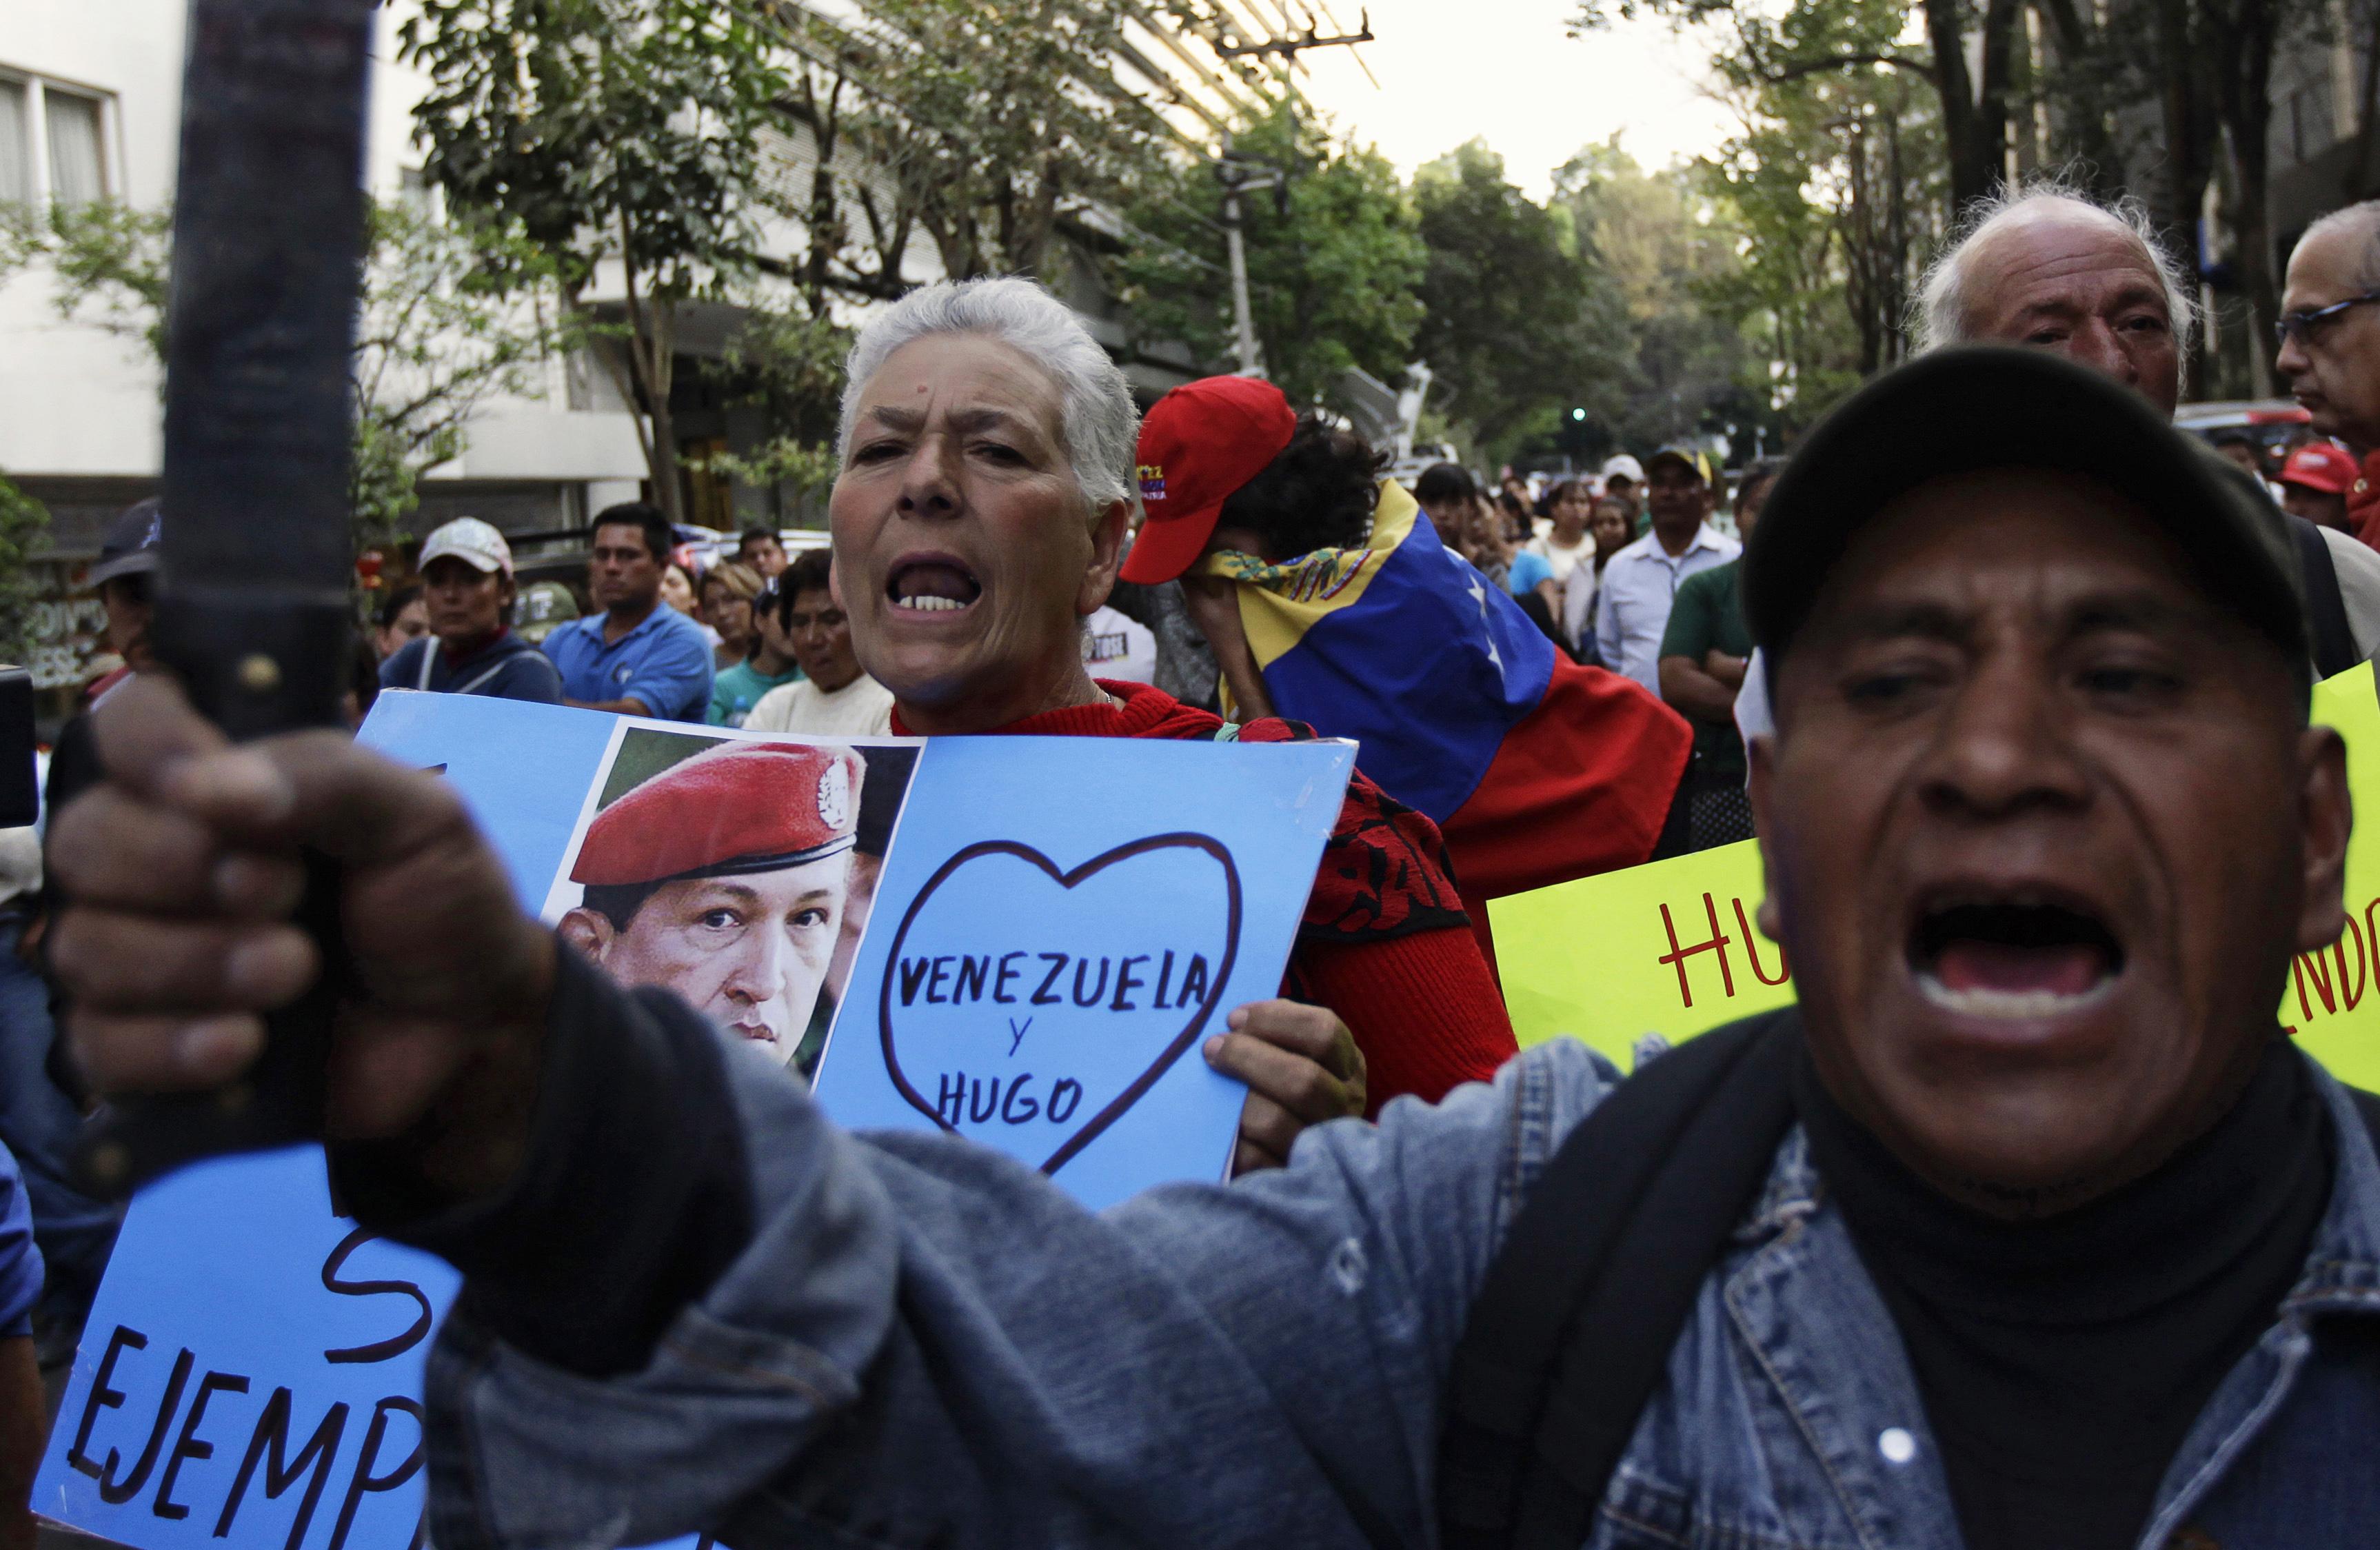 Durant in til da bun 7 uras ha il pievel prendì cumià da Hugo Chavez.